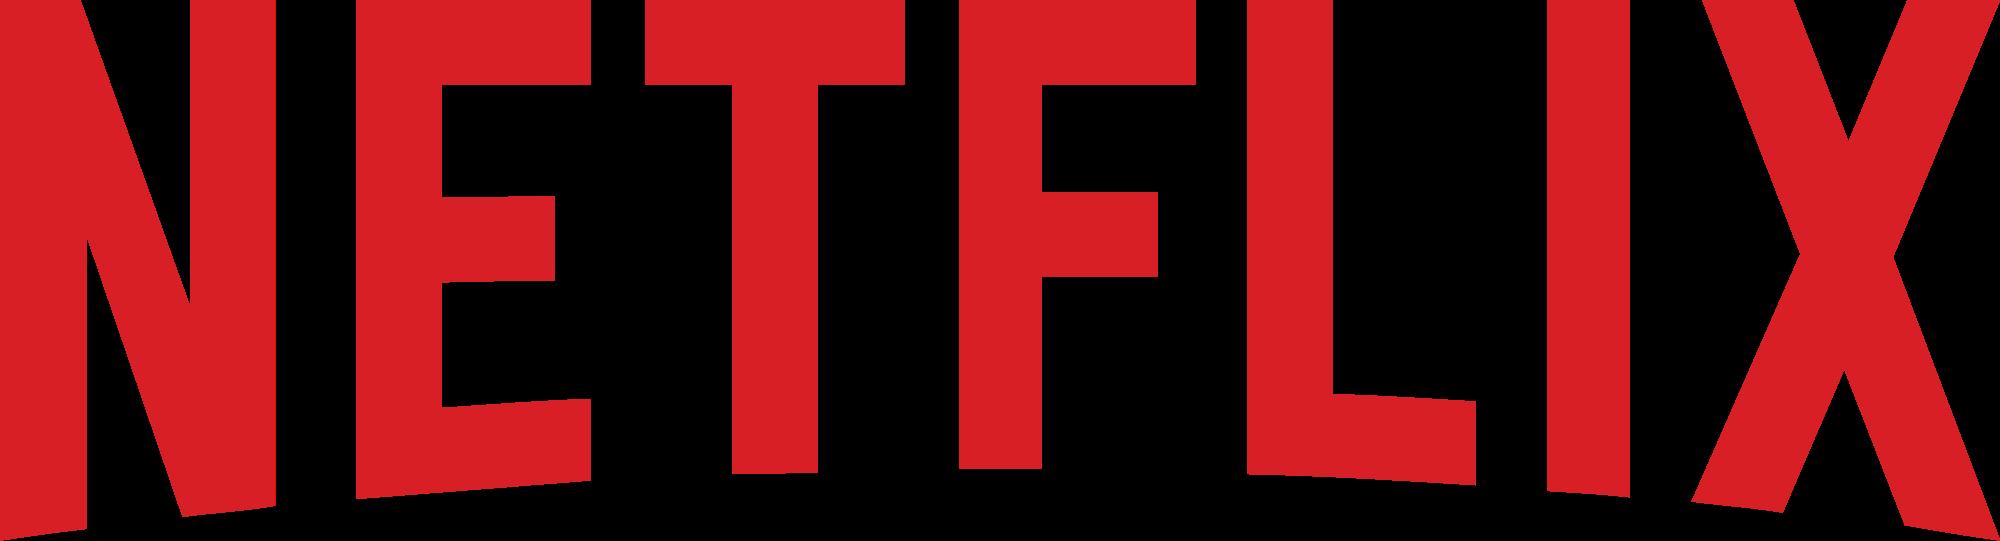 2000px-Netflix_2015_logo.svg